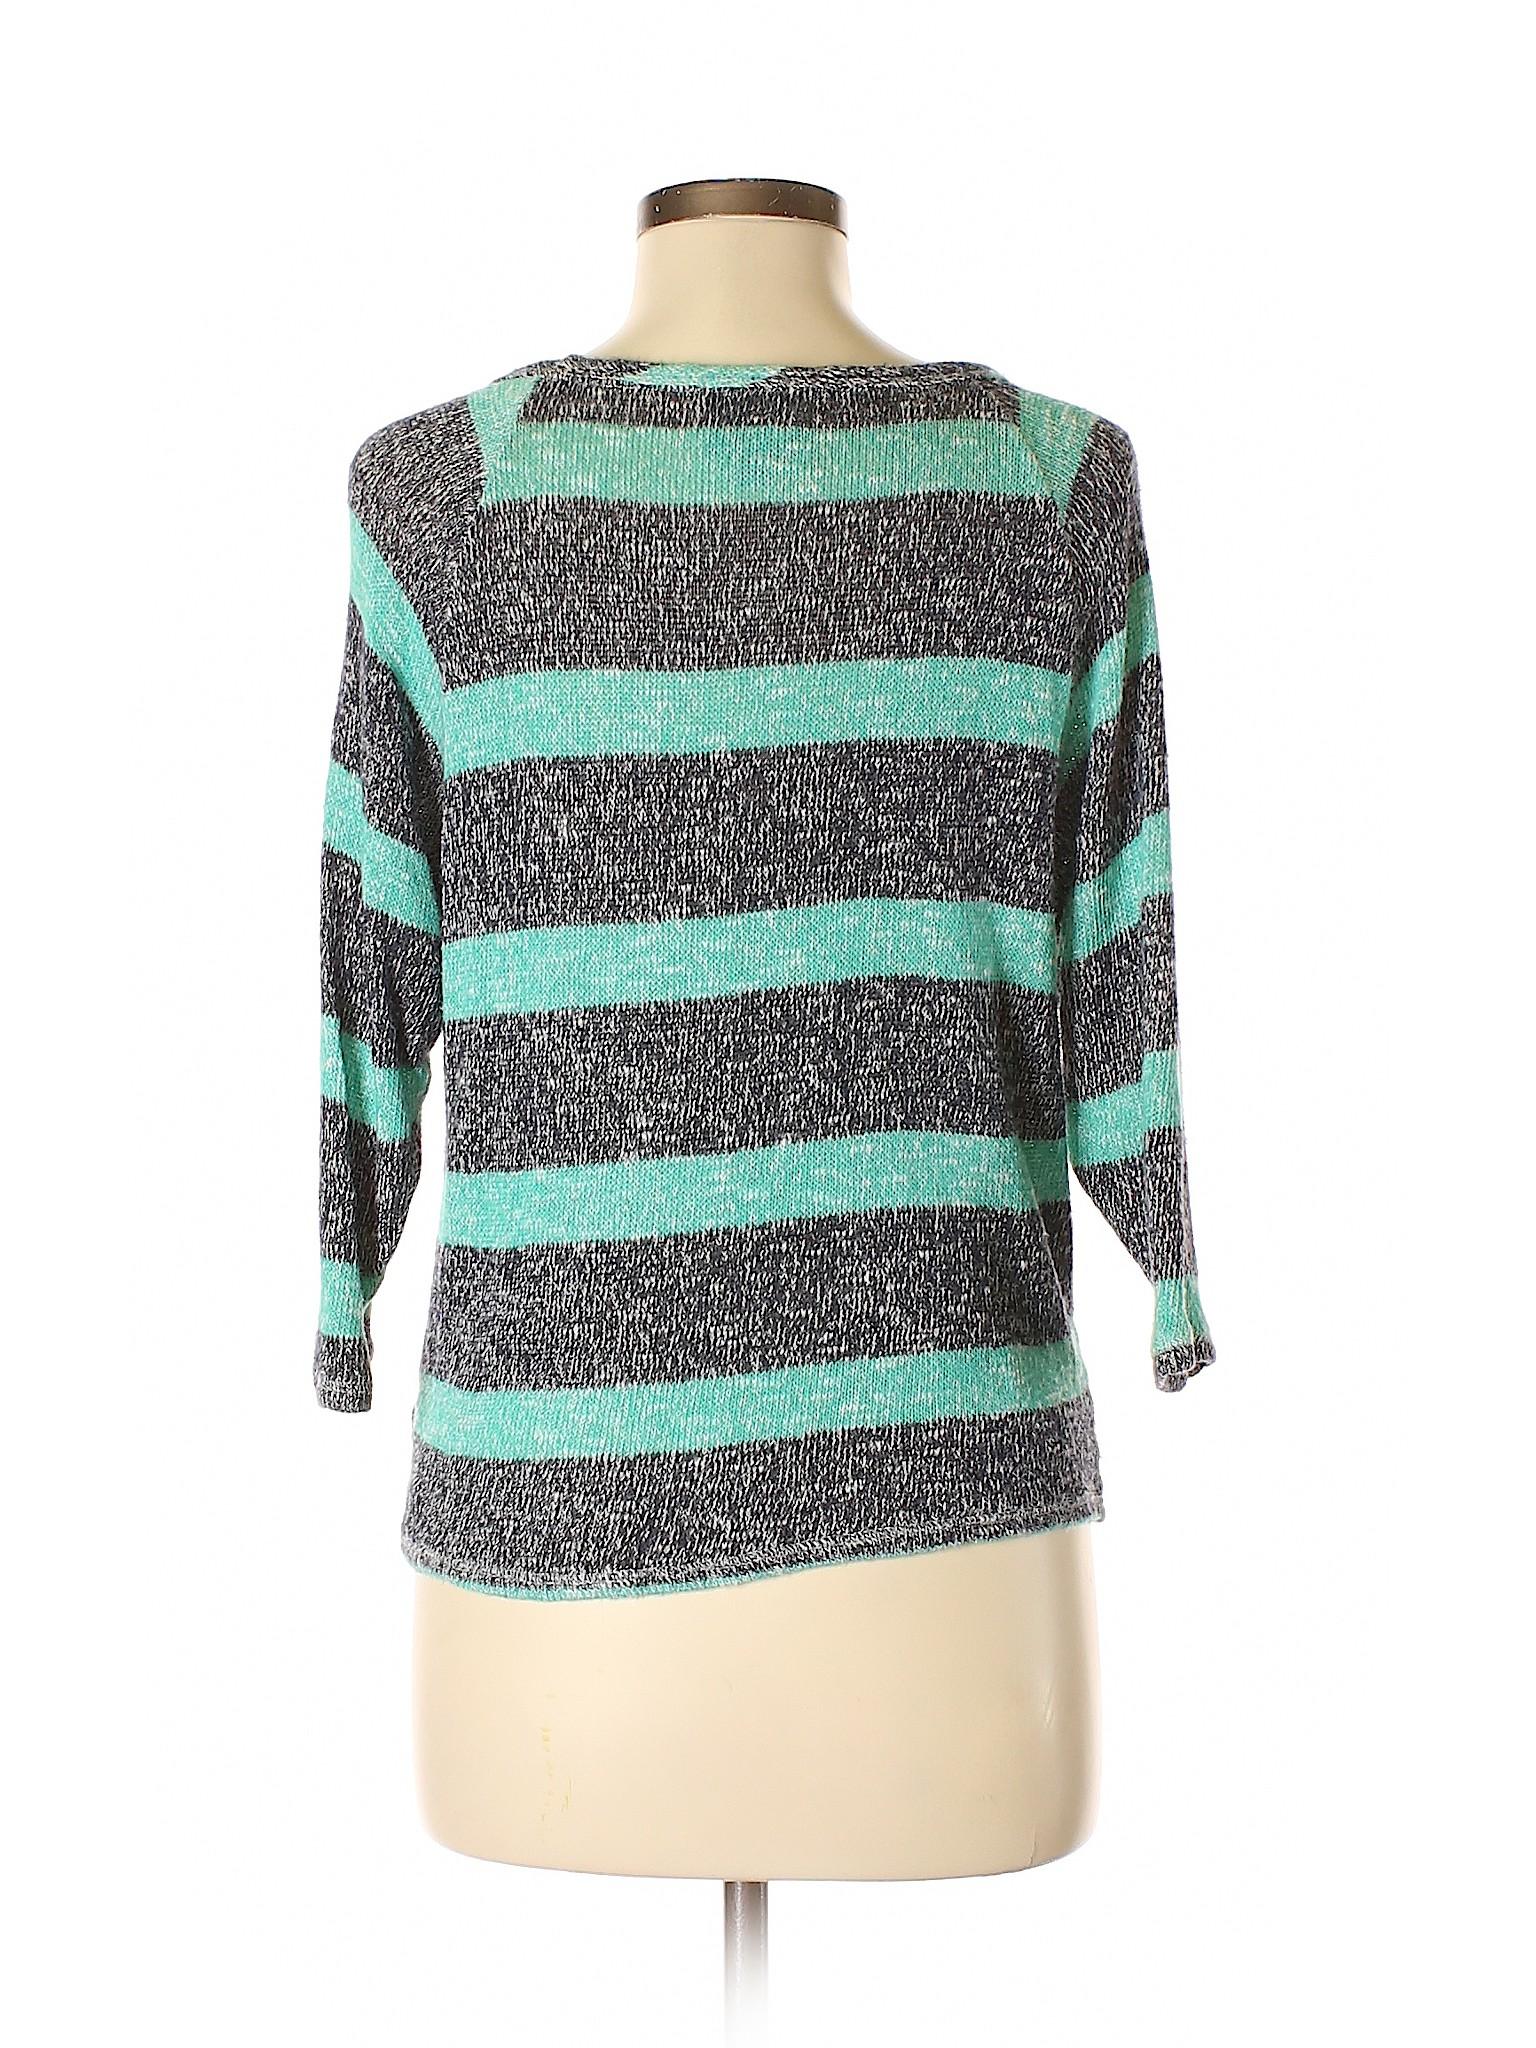 C winter Pullover California amp;C Boutique Sweater AwSRWq81x0